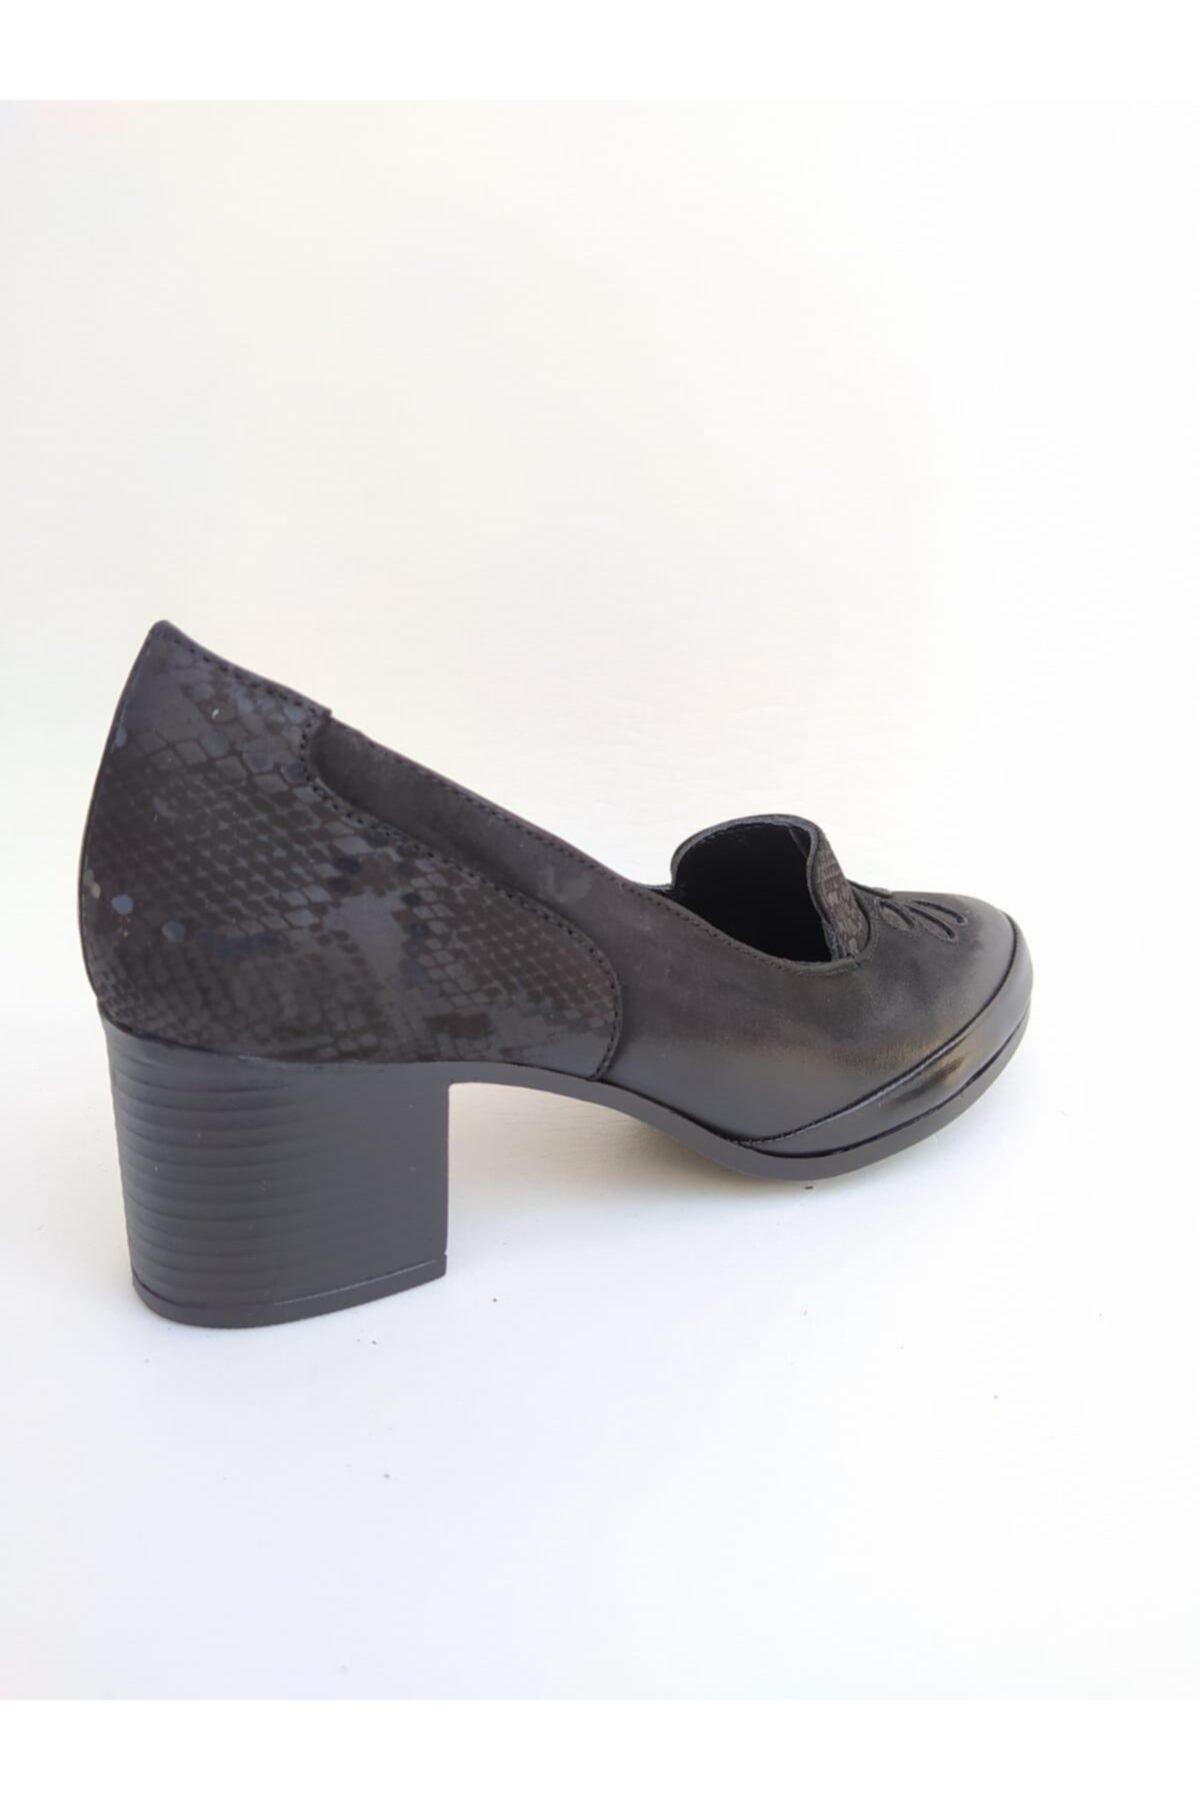 Venüs Kadın Siyah Topuklu Orjinal Deri Ayakkabı 1911922k 2